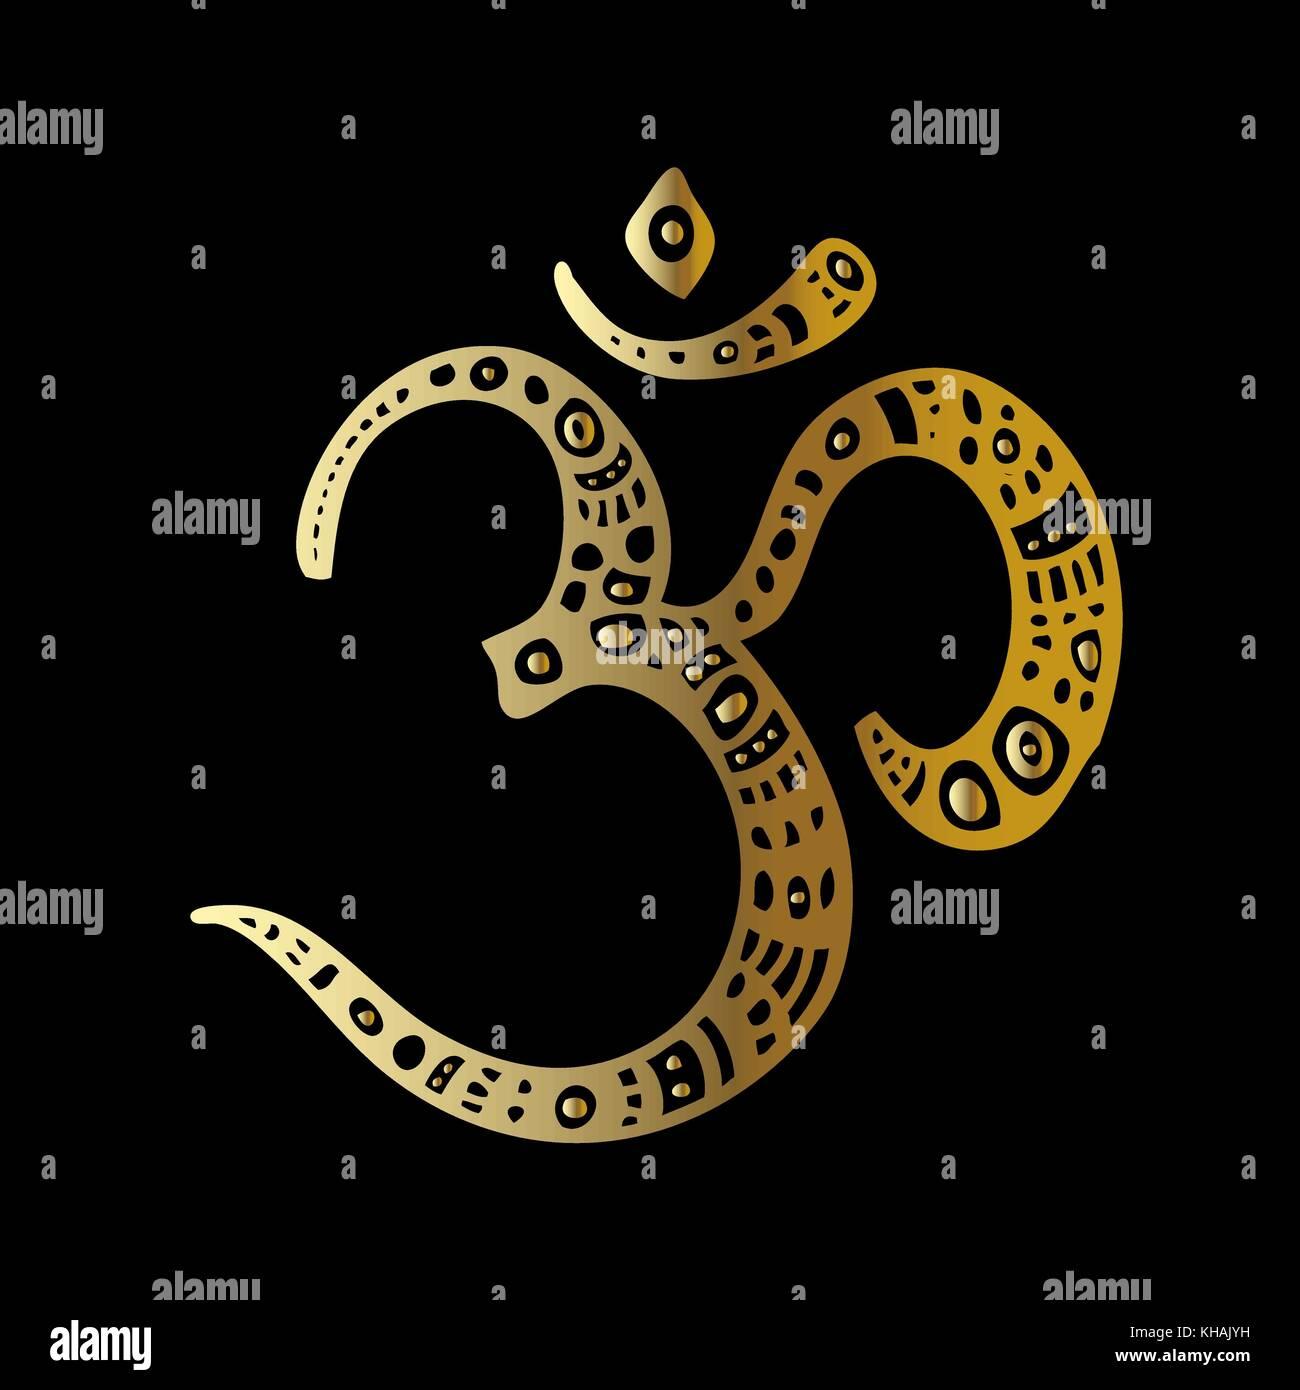 Om symbol aum ohm stock vector art illustration vector image om symbol aum ohm buycottarizona Image collections